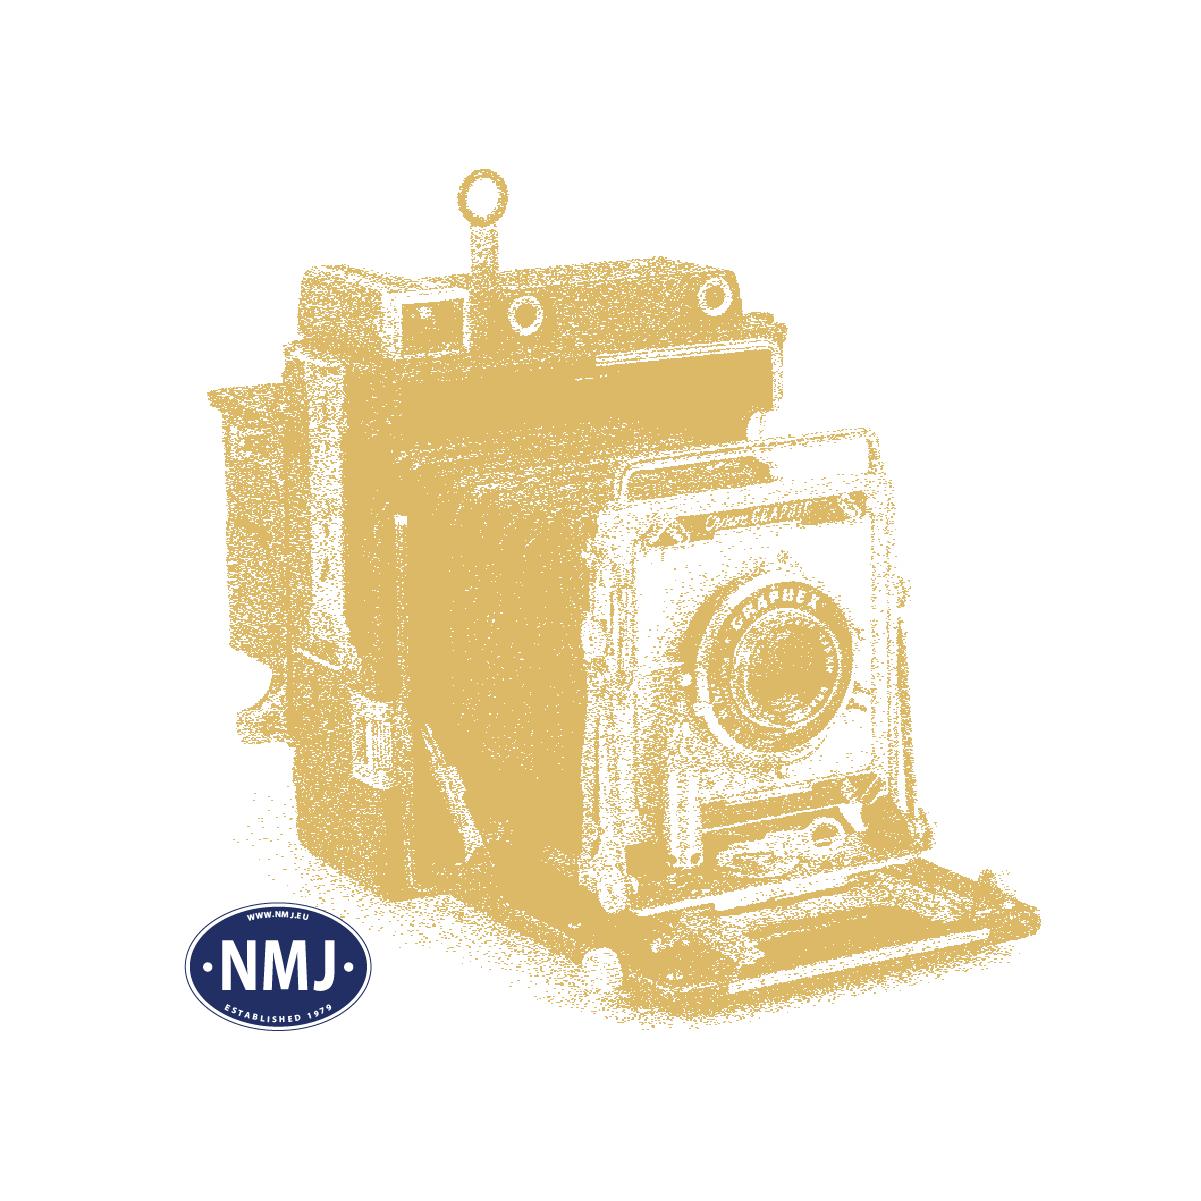 NMJT403.103 - MAV-Start CAF Perseonvogn Bpmz  61 55 20-91 113-7